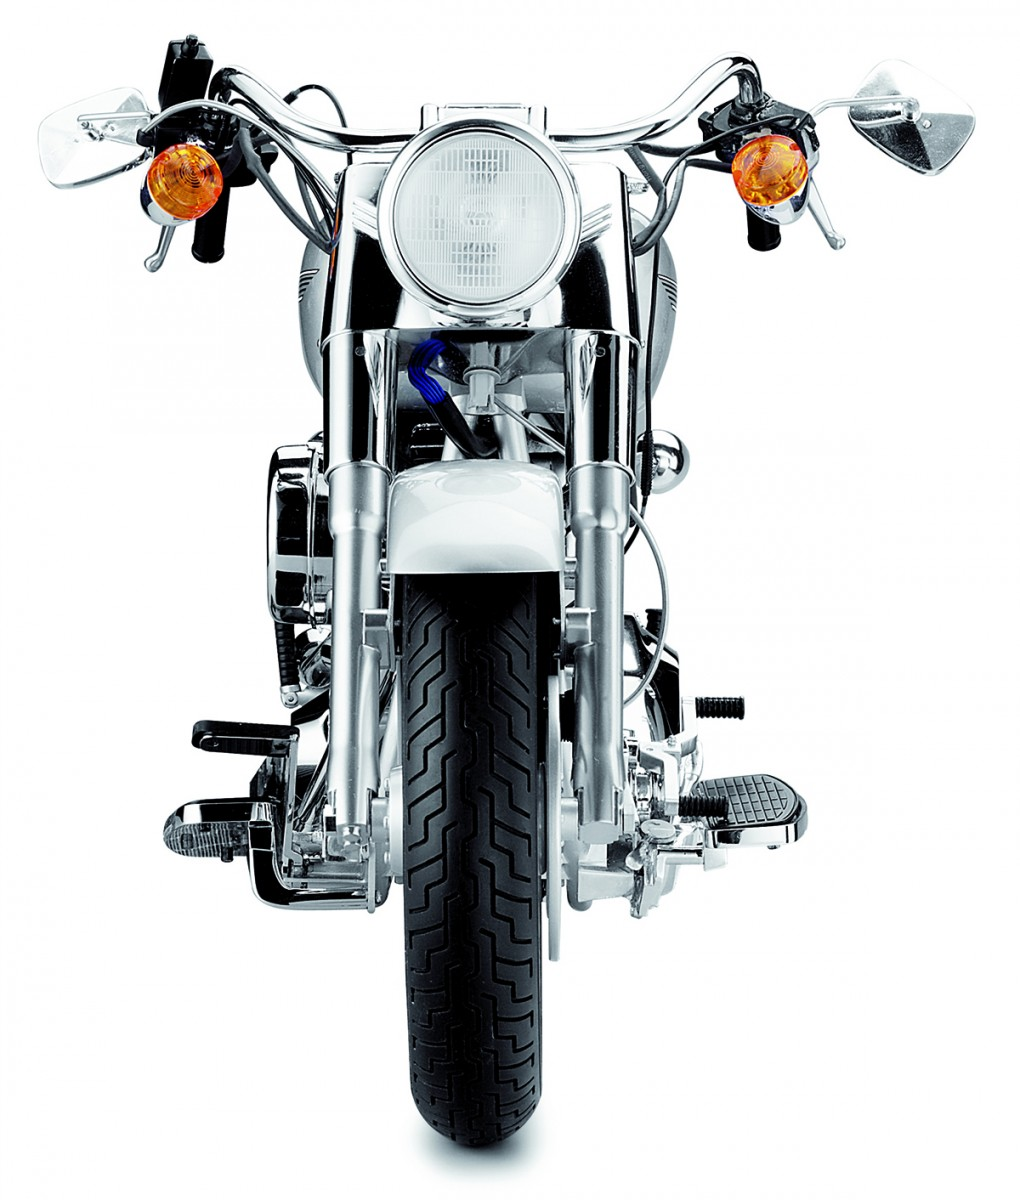 Harley-Davidson Fat Boy - History of a Motorcycle Legend